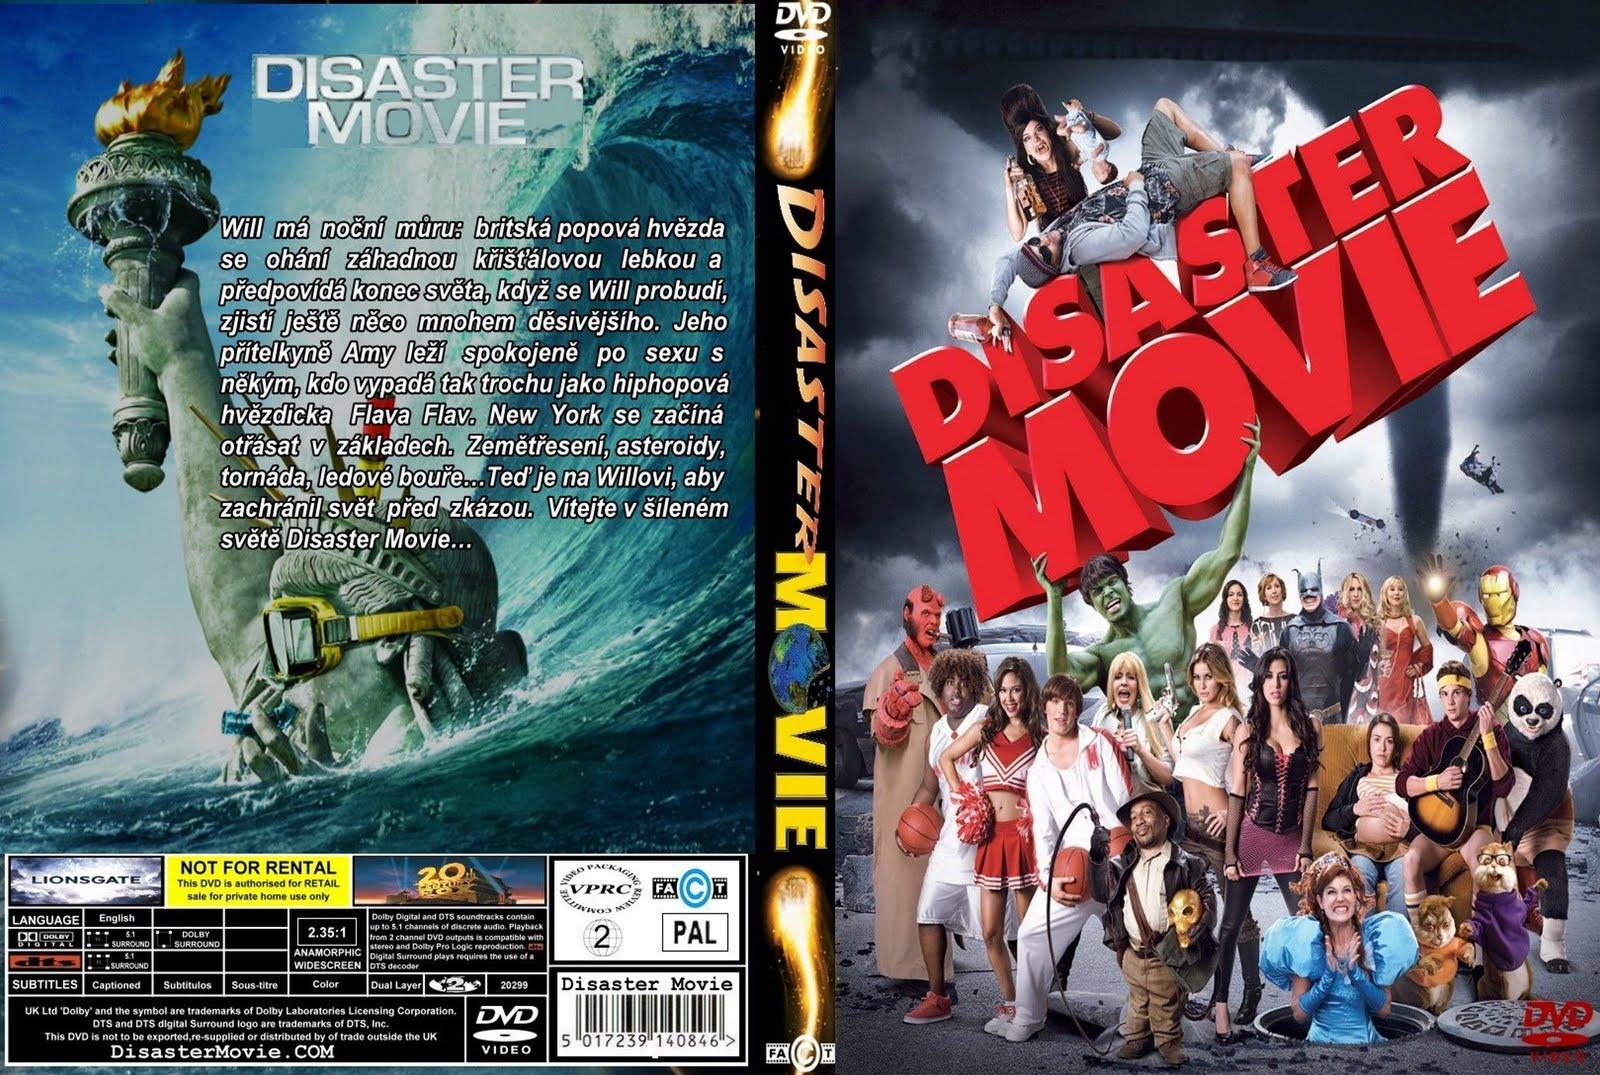 http://4.bp.blogspot.com/-2zyOwnDNx5o/Tu4HCw8Y_PI/AAAAAAACquk/87Rlccyi18o/s1600/Disaster_movie%2B2008a.jpg